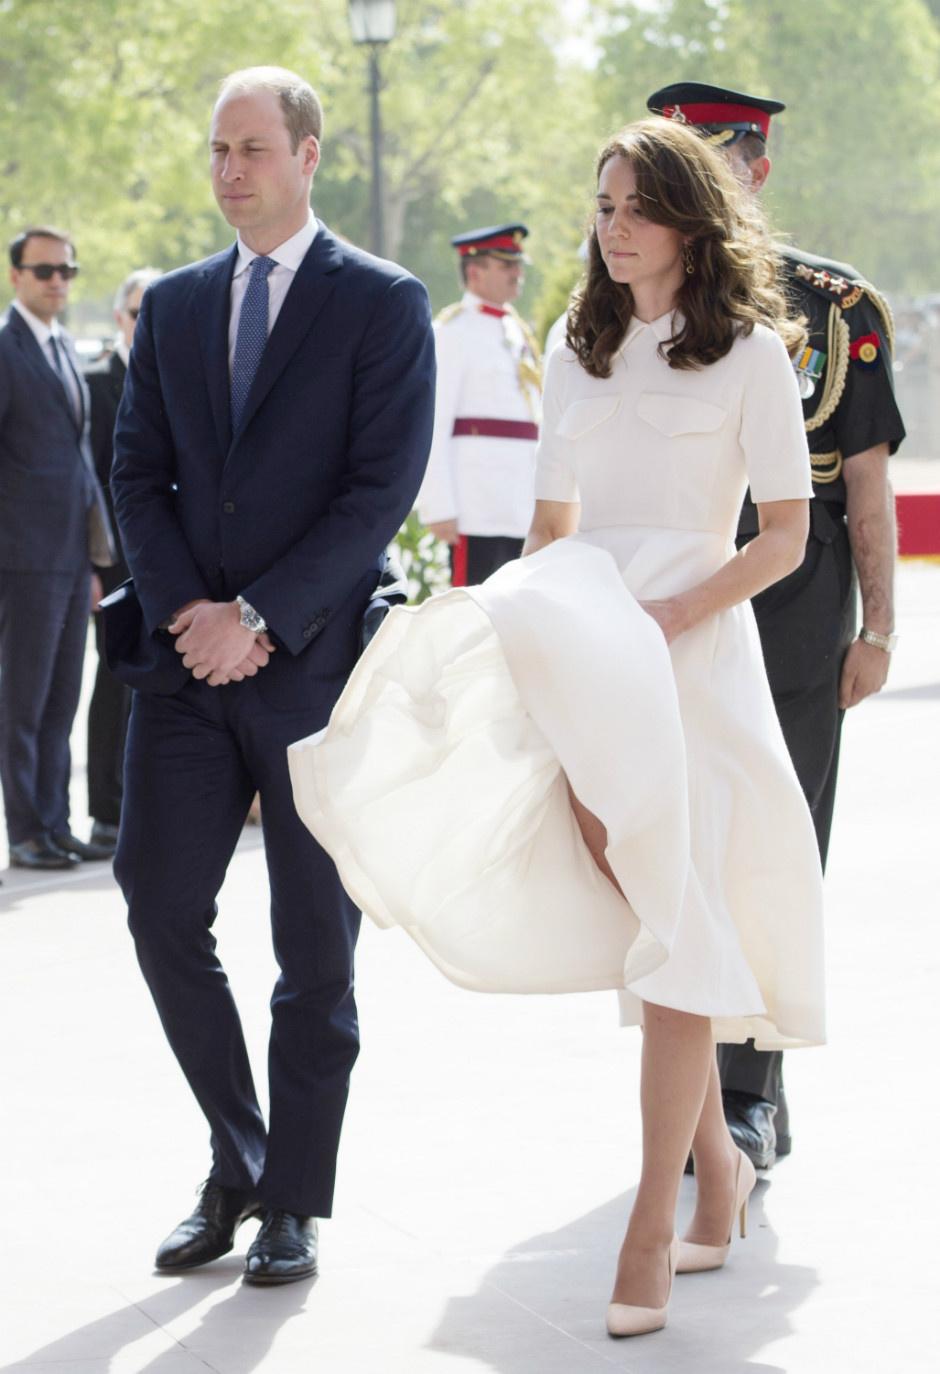 10 раз, когда Кейт Миддлтон пренебрегла королевским дресс-кодом фото [8]